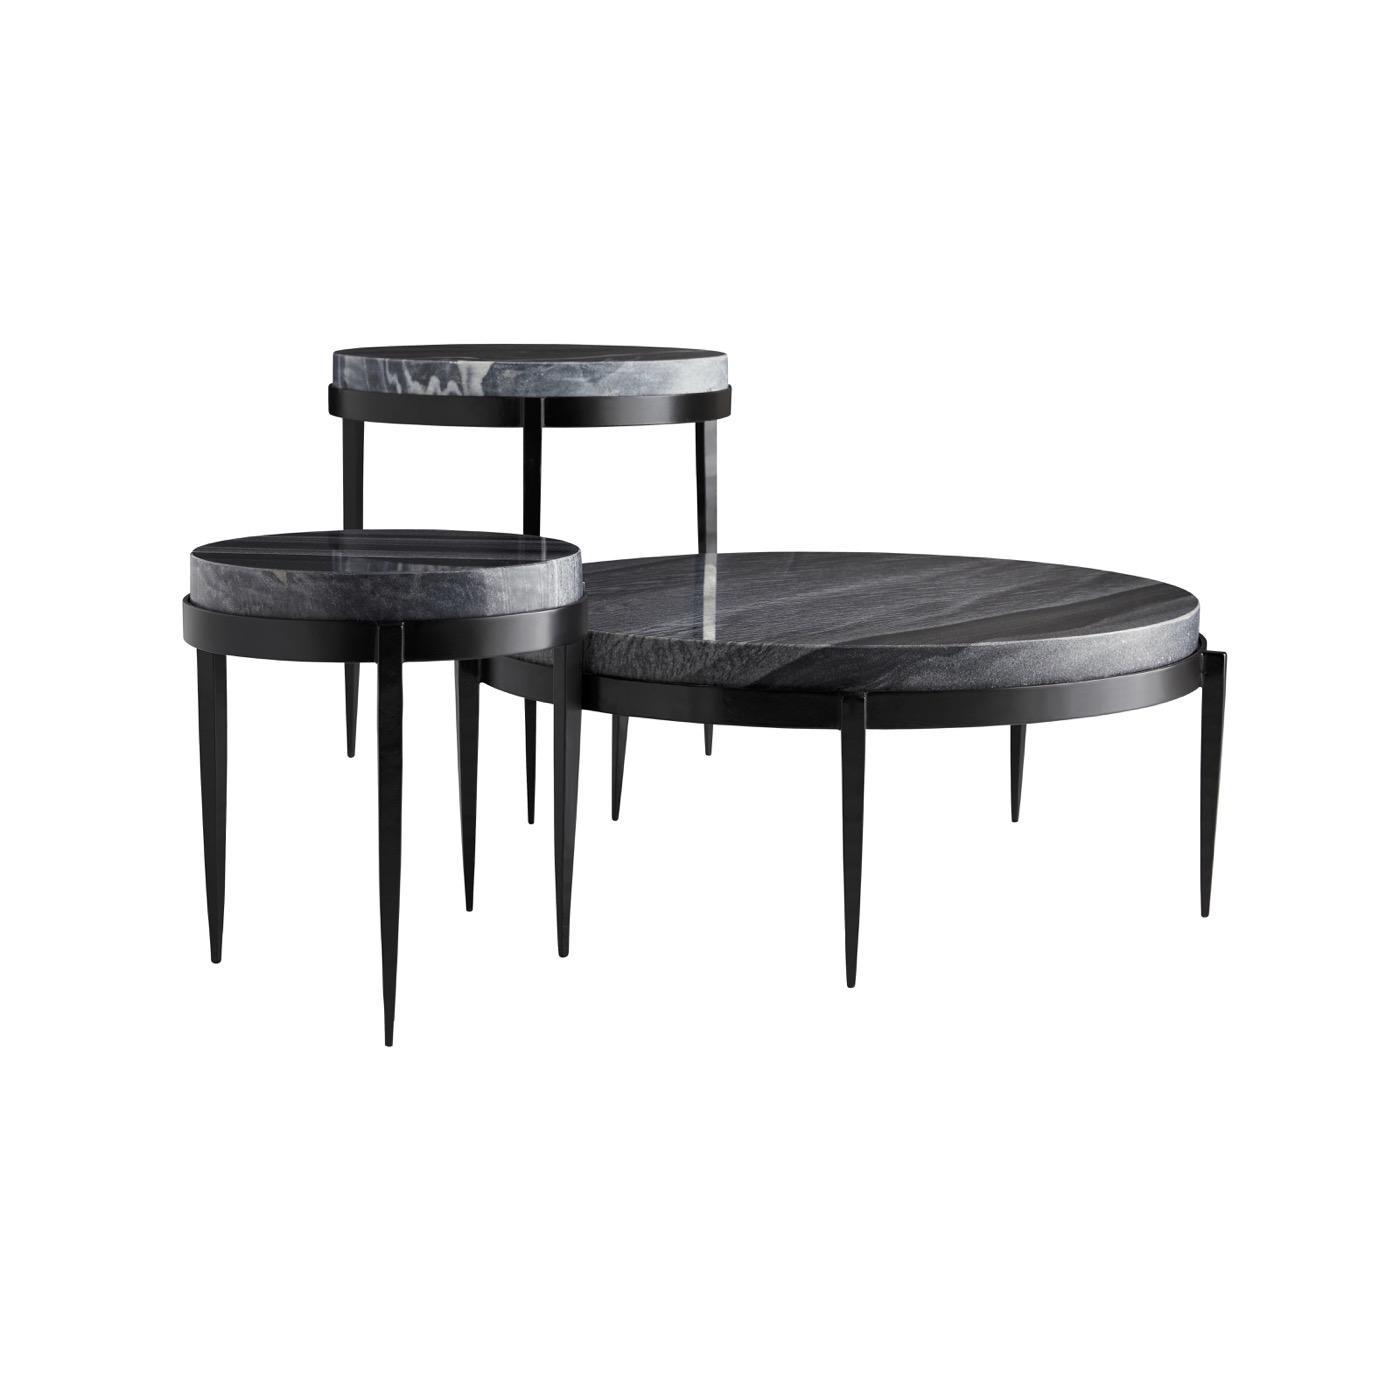 Apollo Coffee Table | Black Marble